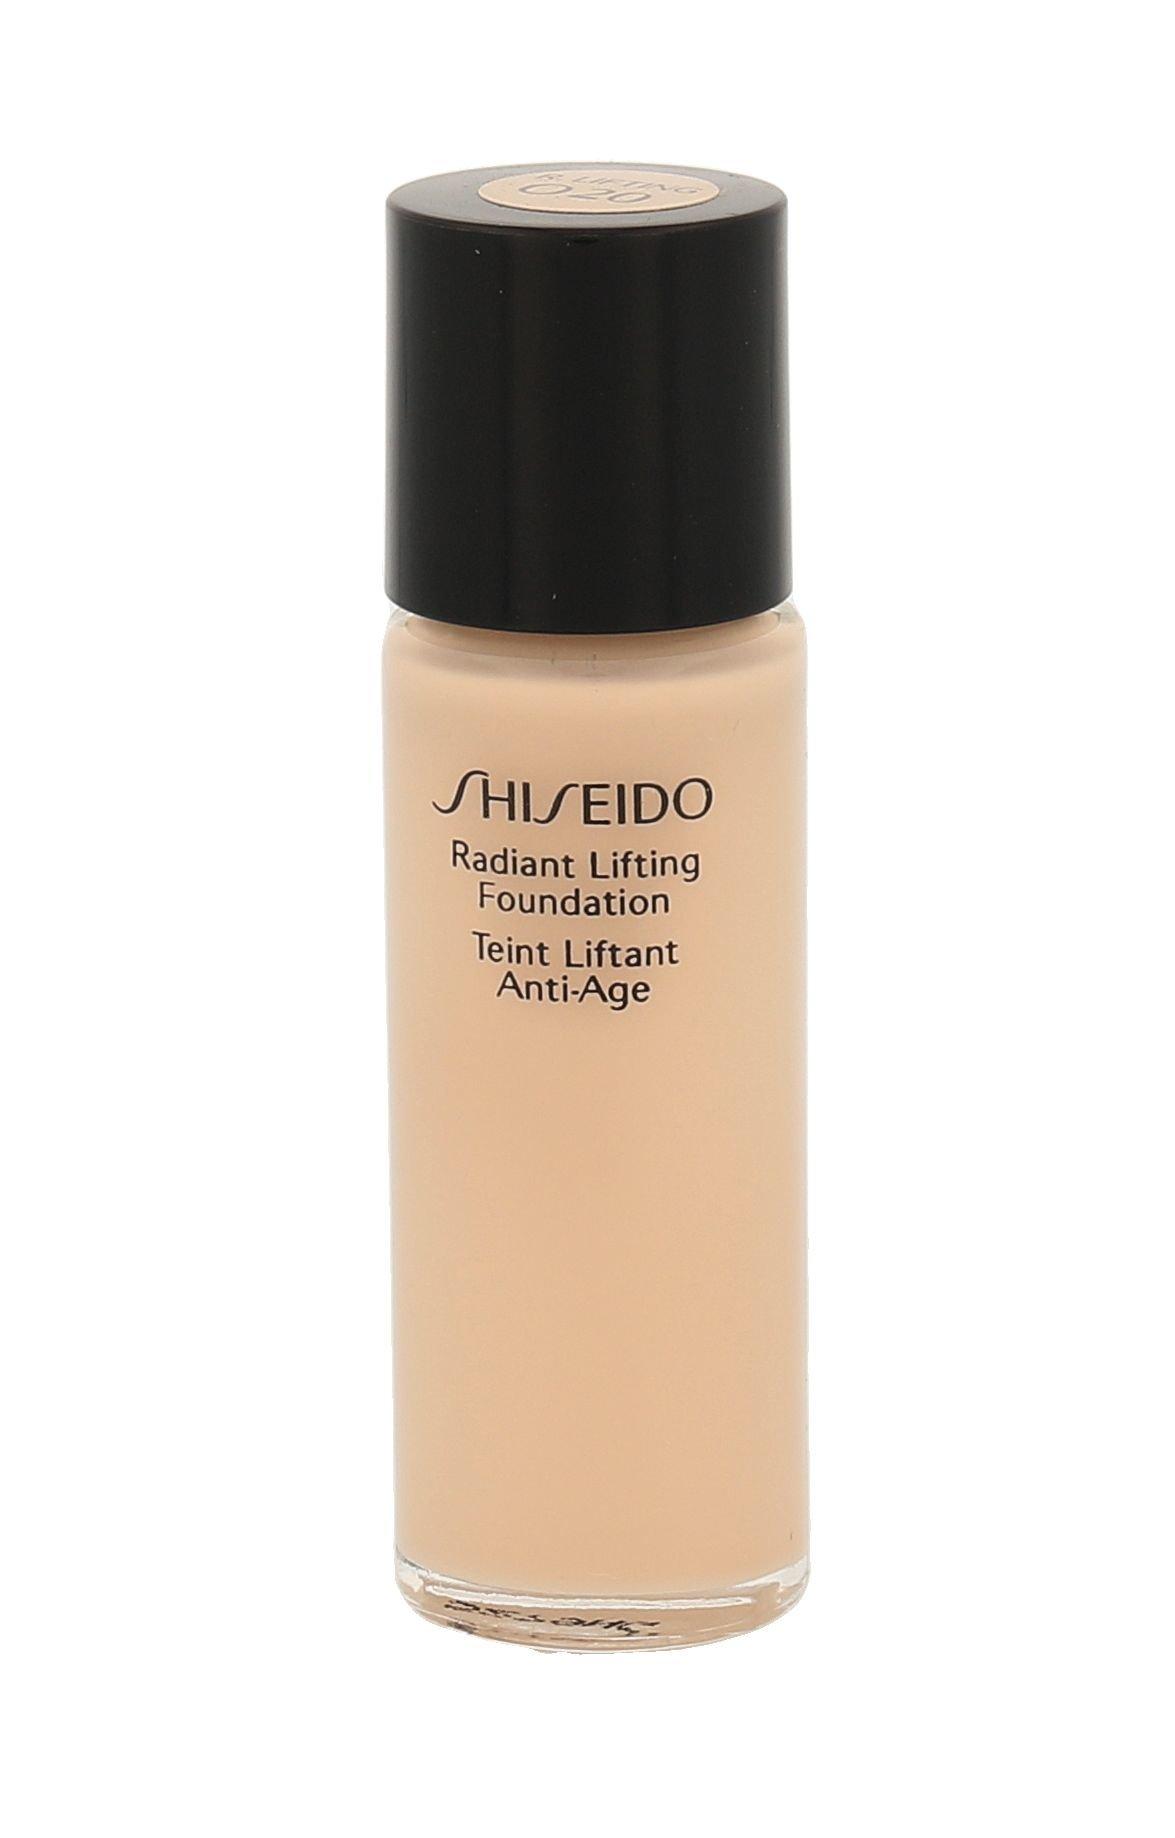 Shiseido Radiant Lifting Foundation Cosmetic 15ml O20 Natural Light Ochre